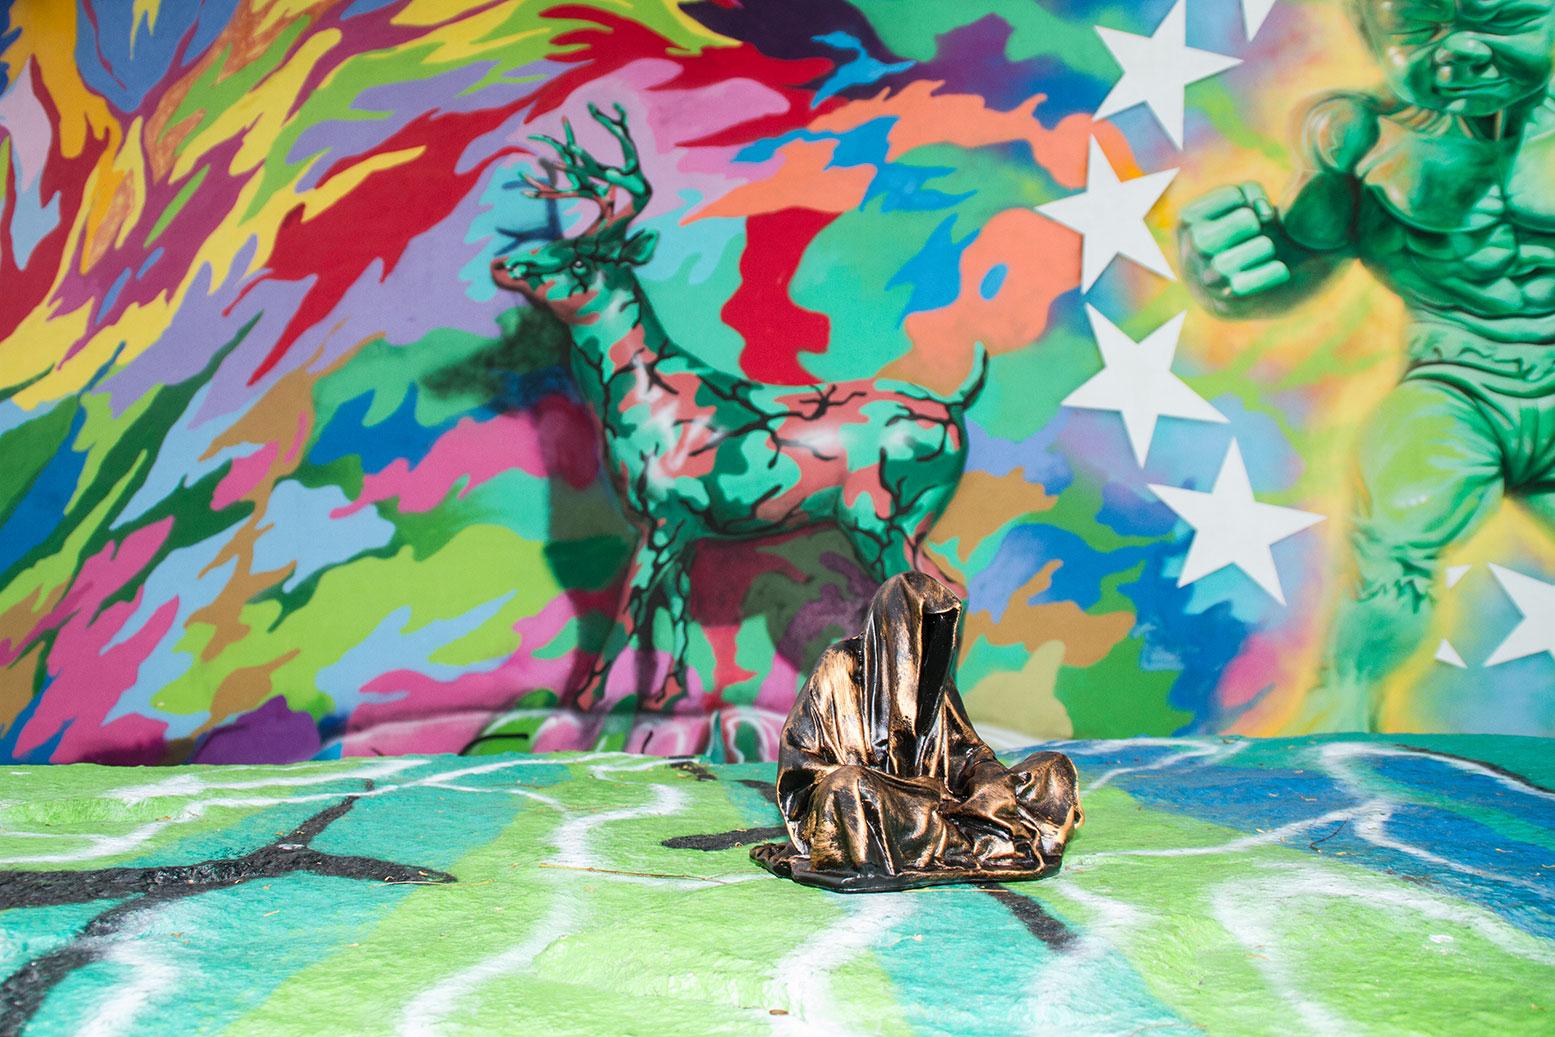 art-basel-miami-beach-fair-usa-florida-wynwood-guardians-of-time-manfred-kili-kielnhofer-contemporary-fine-art-modern-arts-design-antiques-sculpture-spectrum-miami-7566